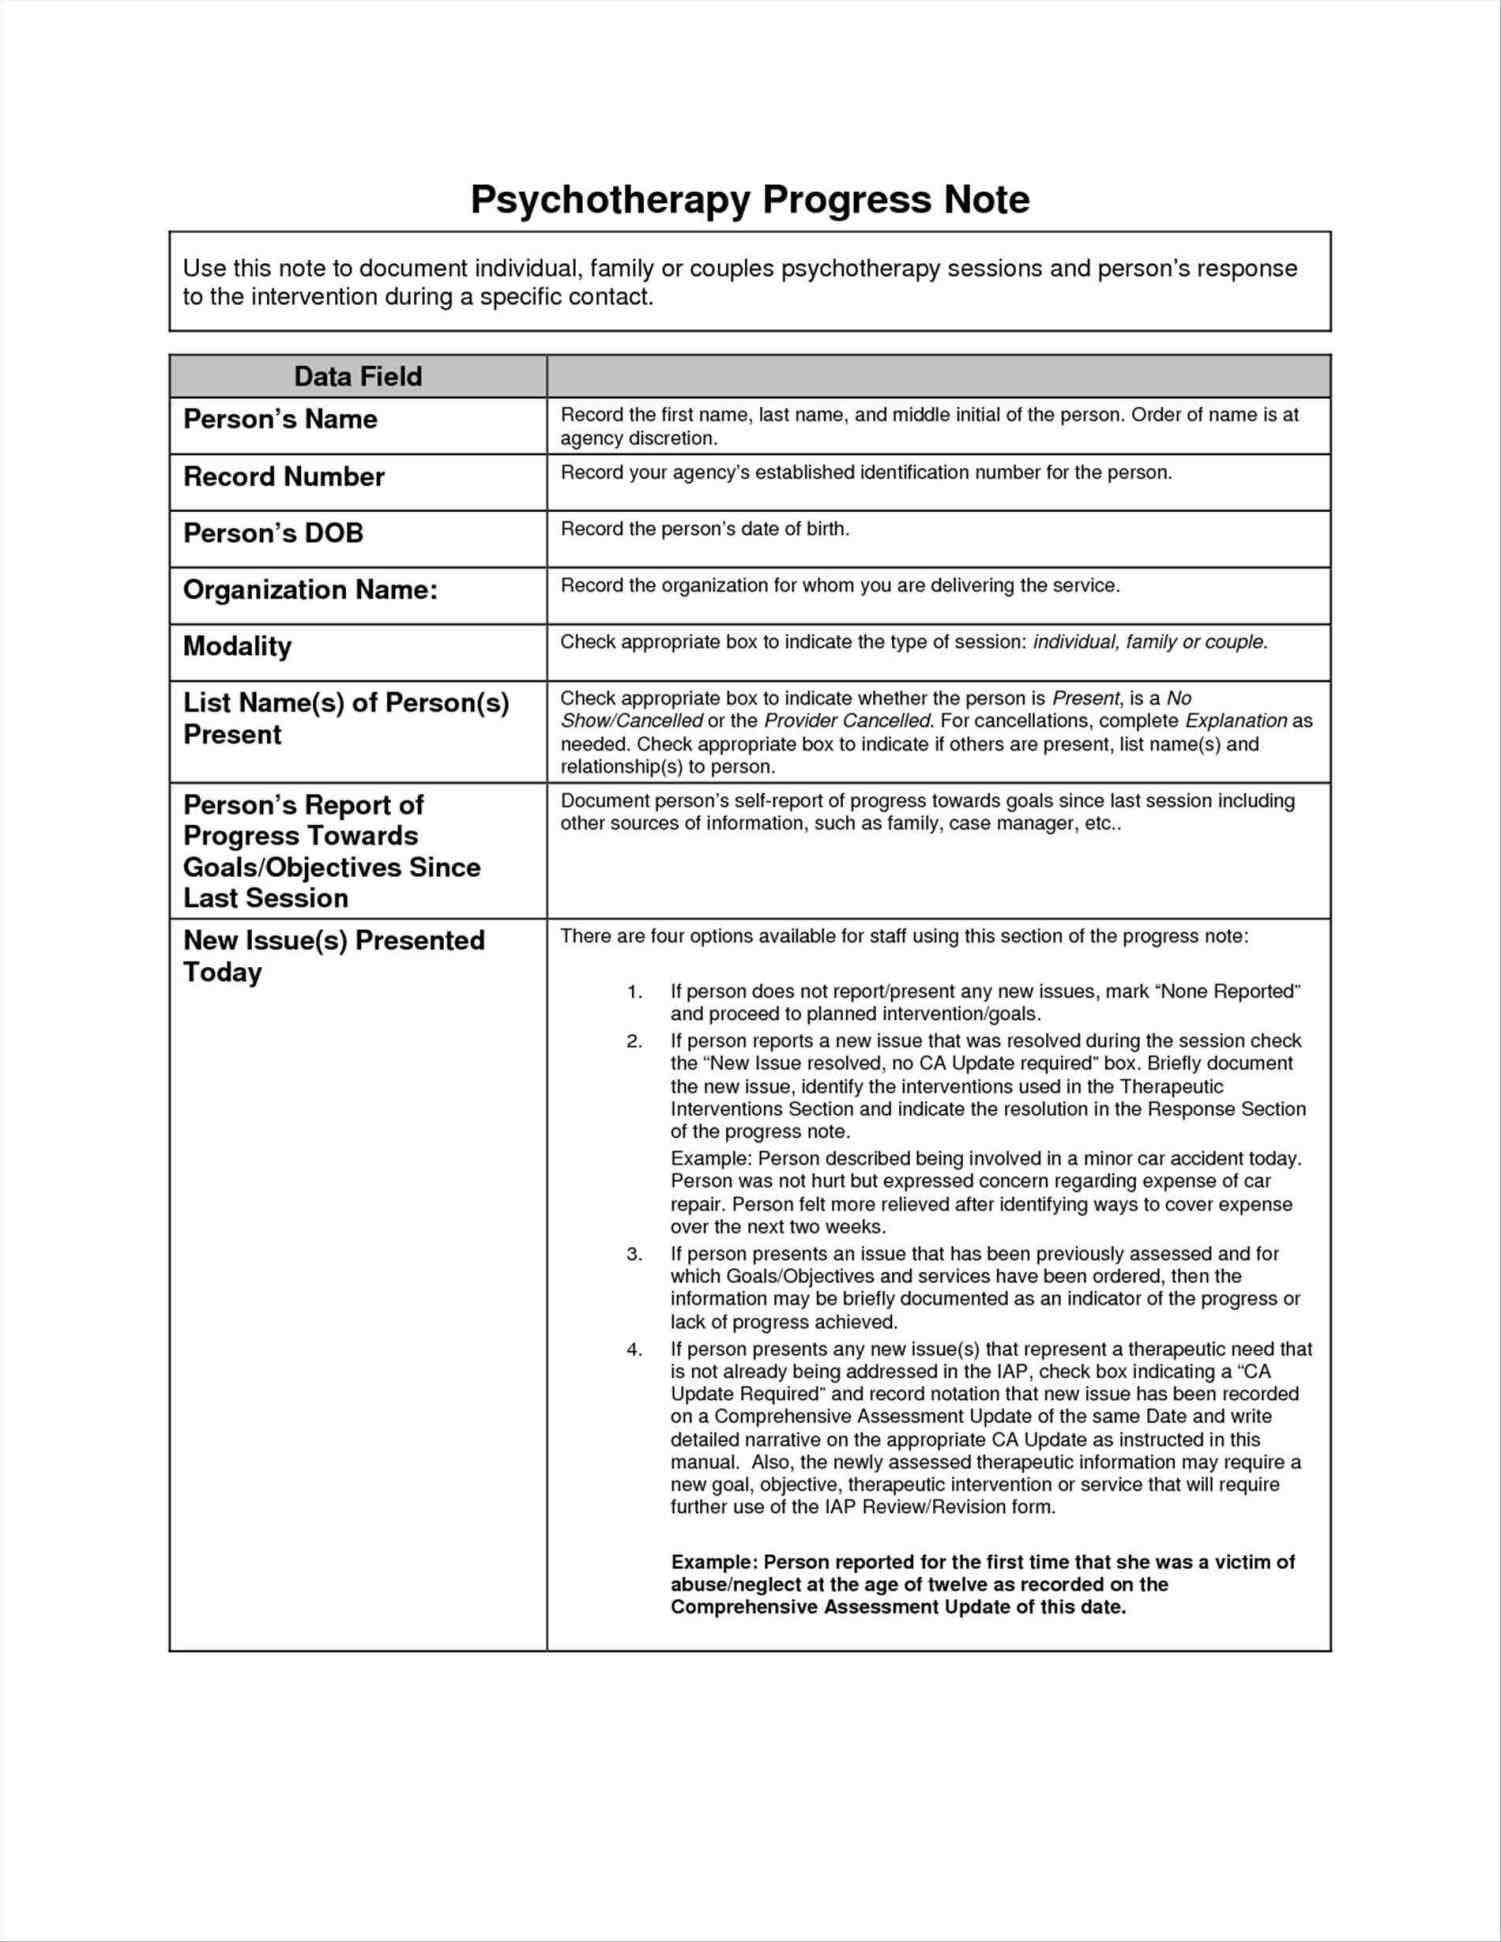 Patient Progress Note Template - Sample Templates - Sample Templates